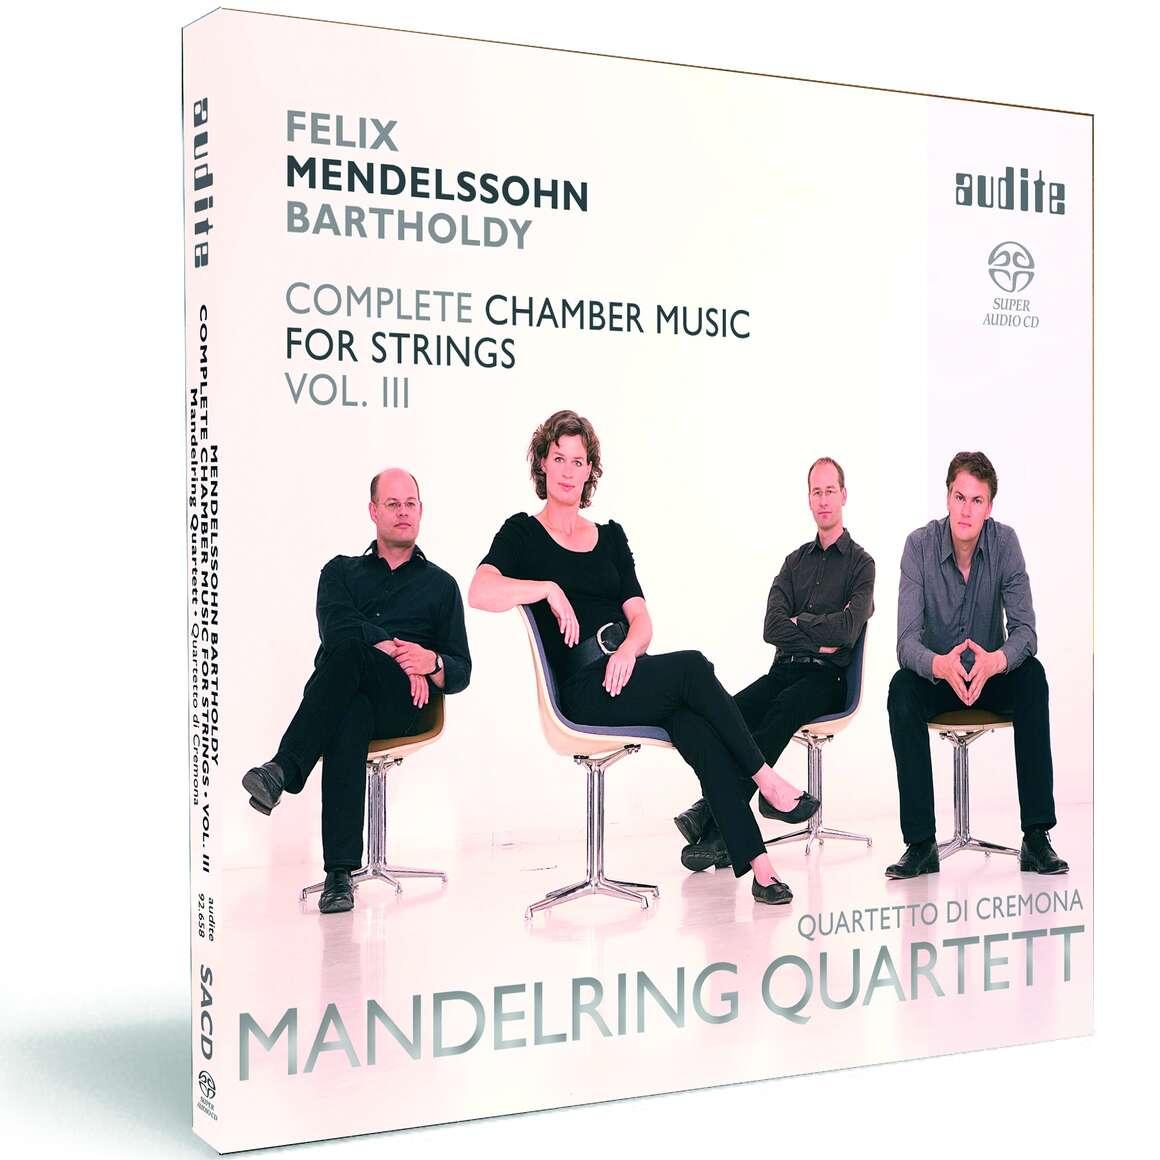 Felix Mendelssohn Bartholdy: String Quartet in E flat major (Op. 44 No. 3), Four Pieces for String Quartet (Op. 81) & Octet in E flat major (Op. 20)